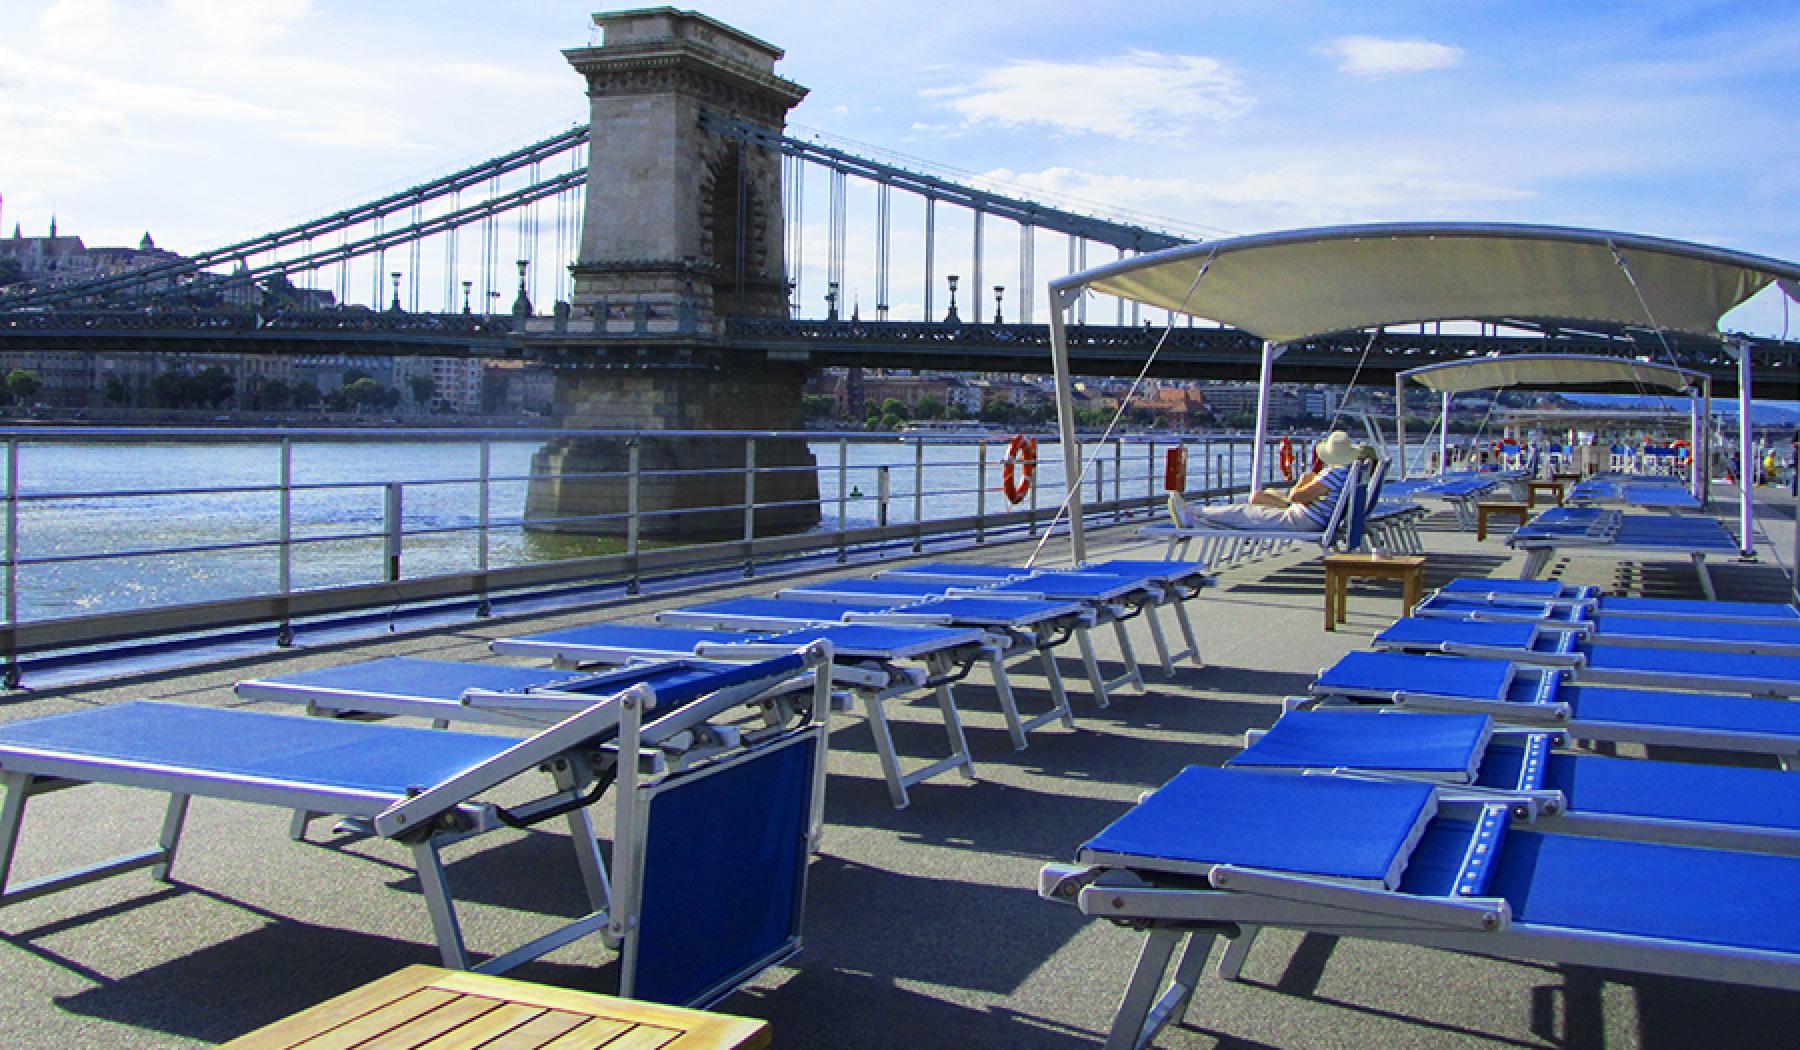 Avalon Waterways Avalon Affinity Exterior Sky Deck Lounge Chairs.jpg